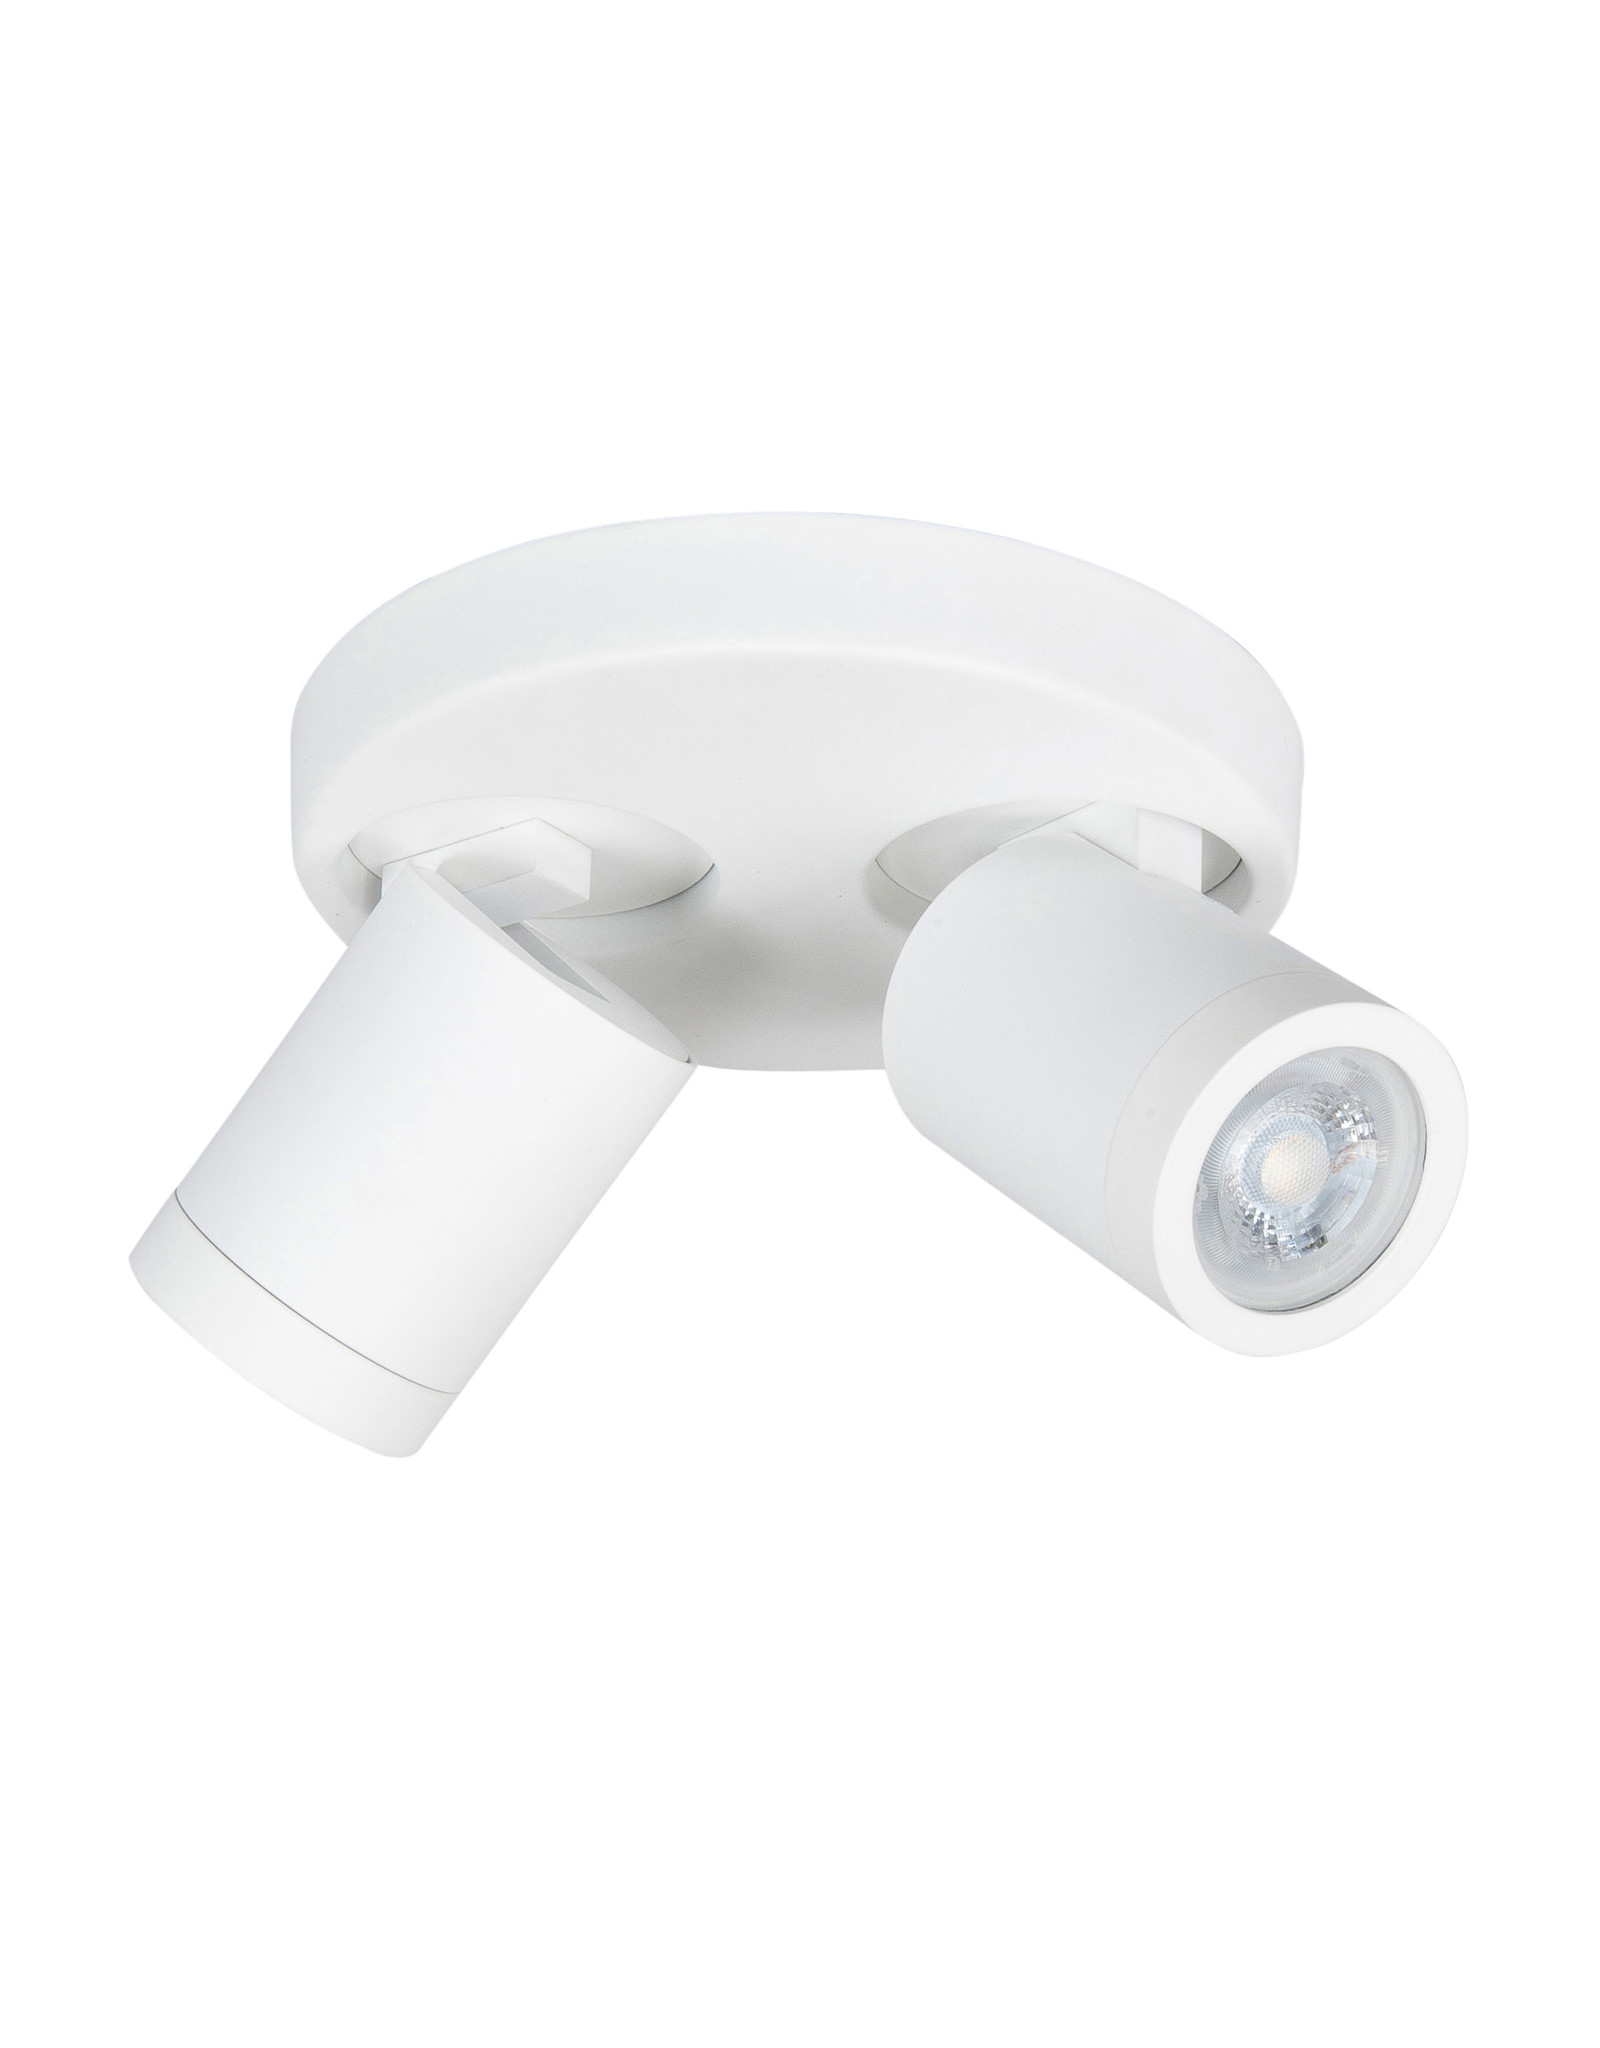 Oliver spot 2 X  GU10 LED IP44 rond Mat Wit zonder lampen